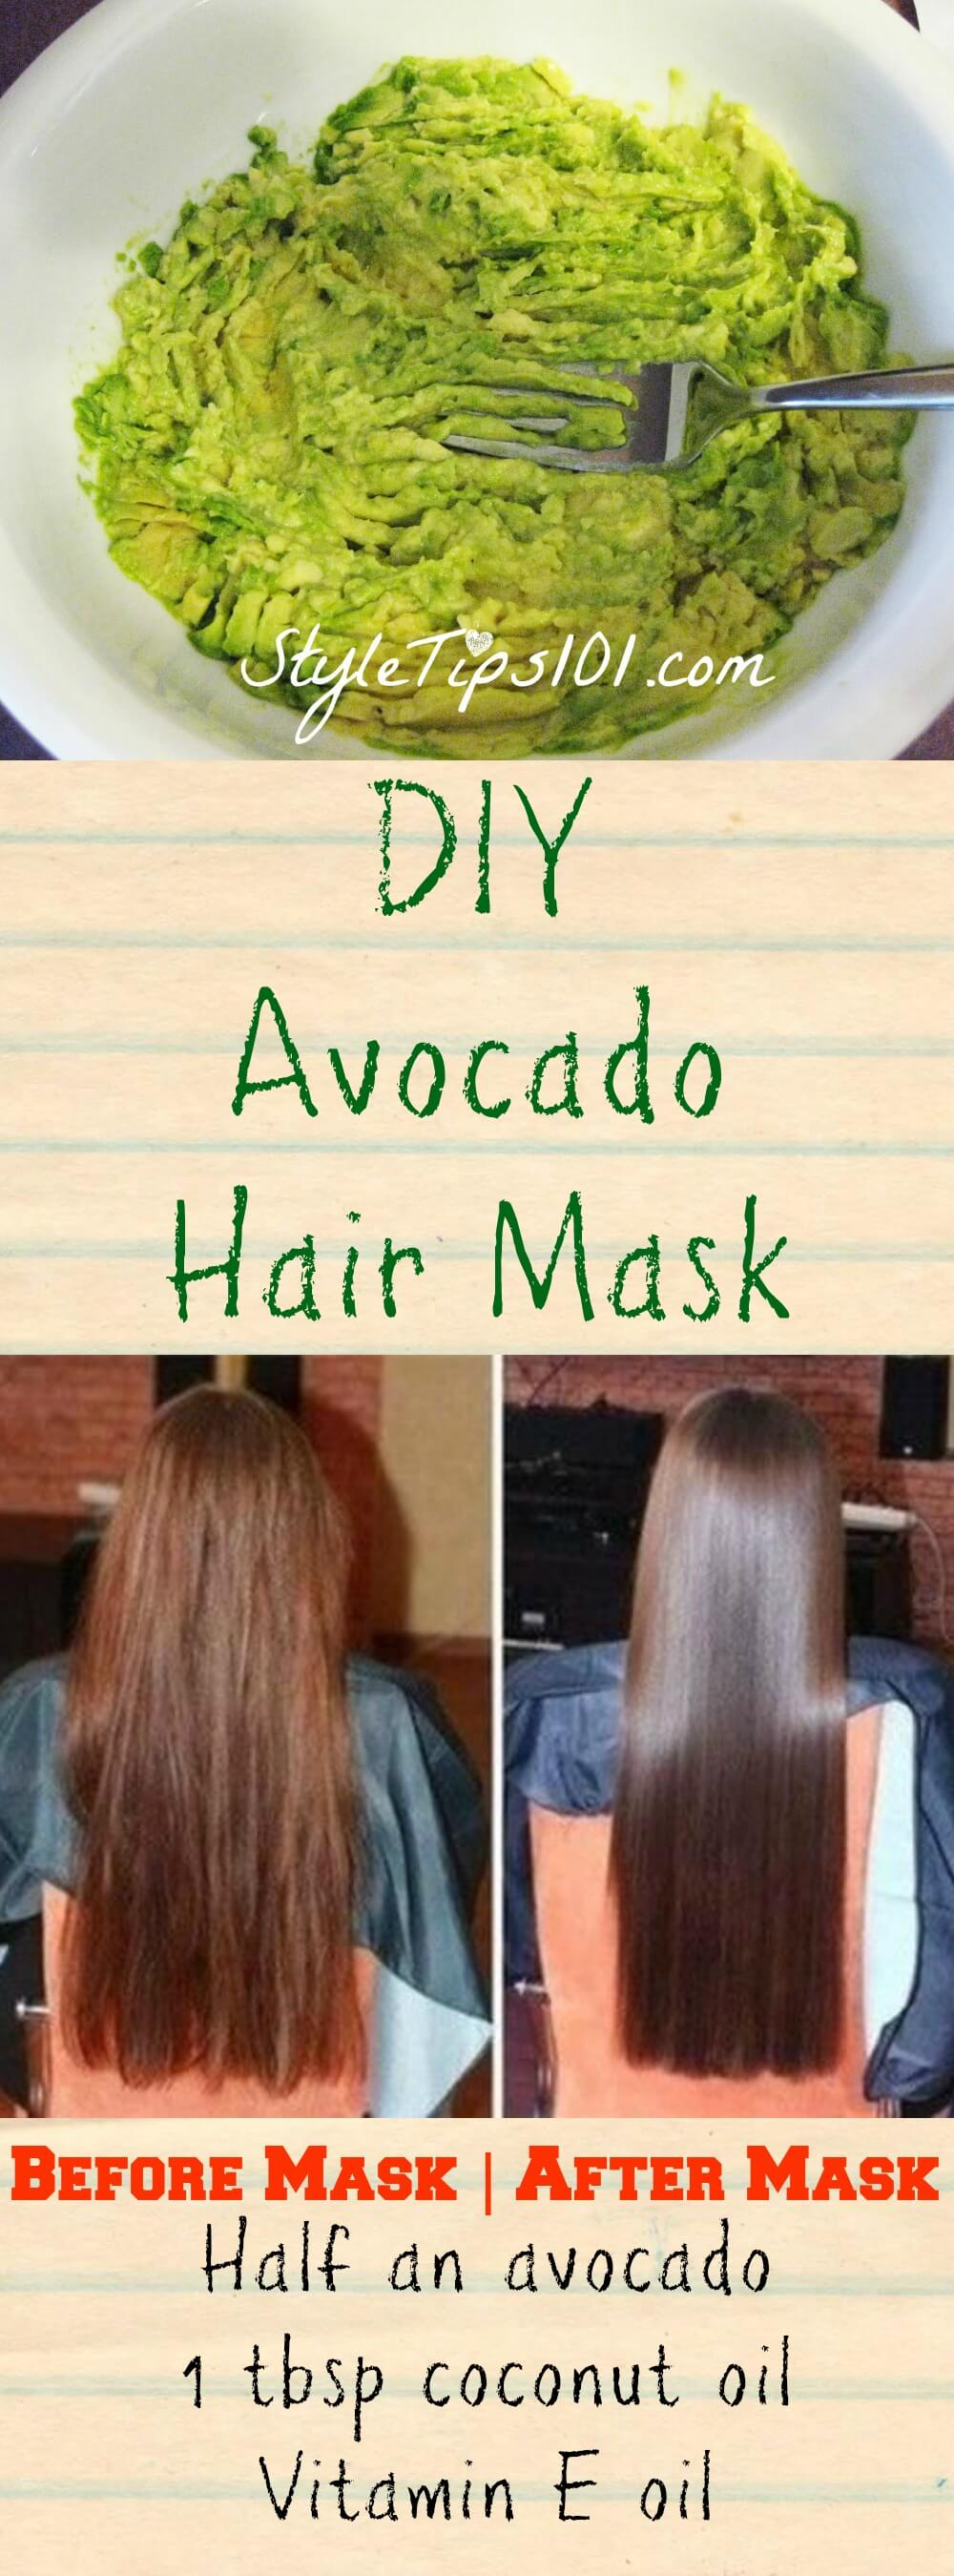 Diy Avocado Hair Mask For Dry Hair